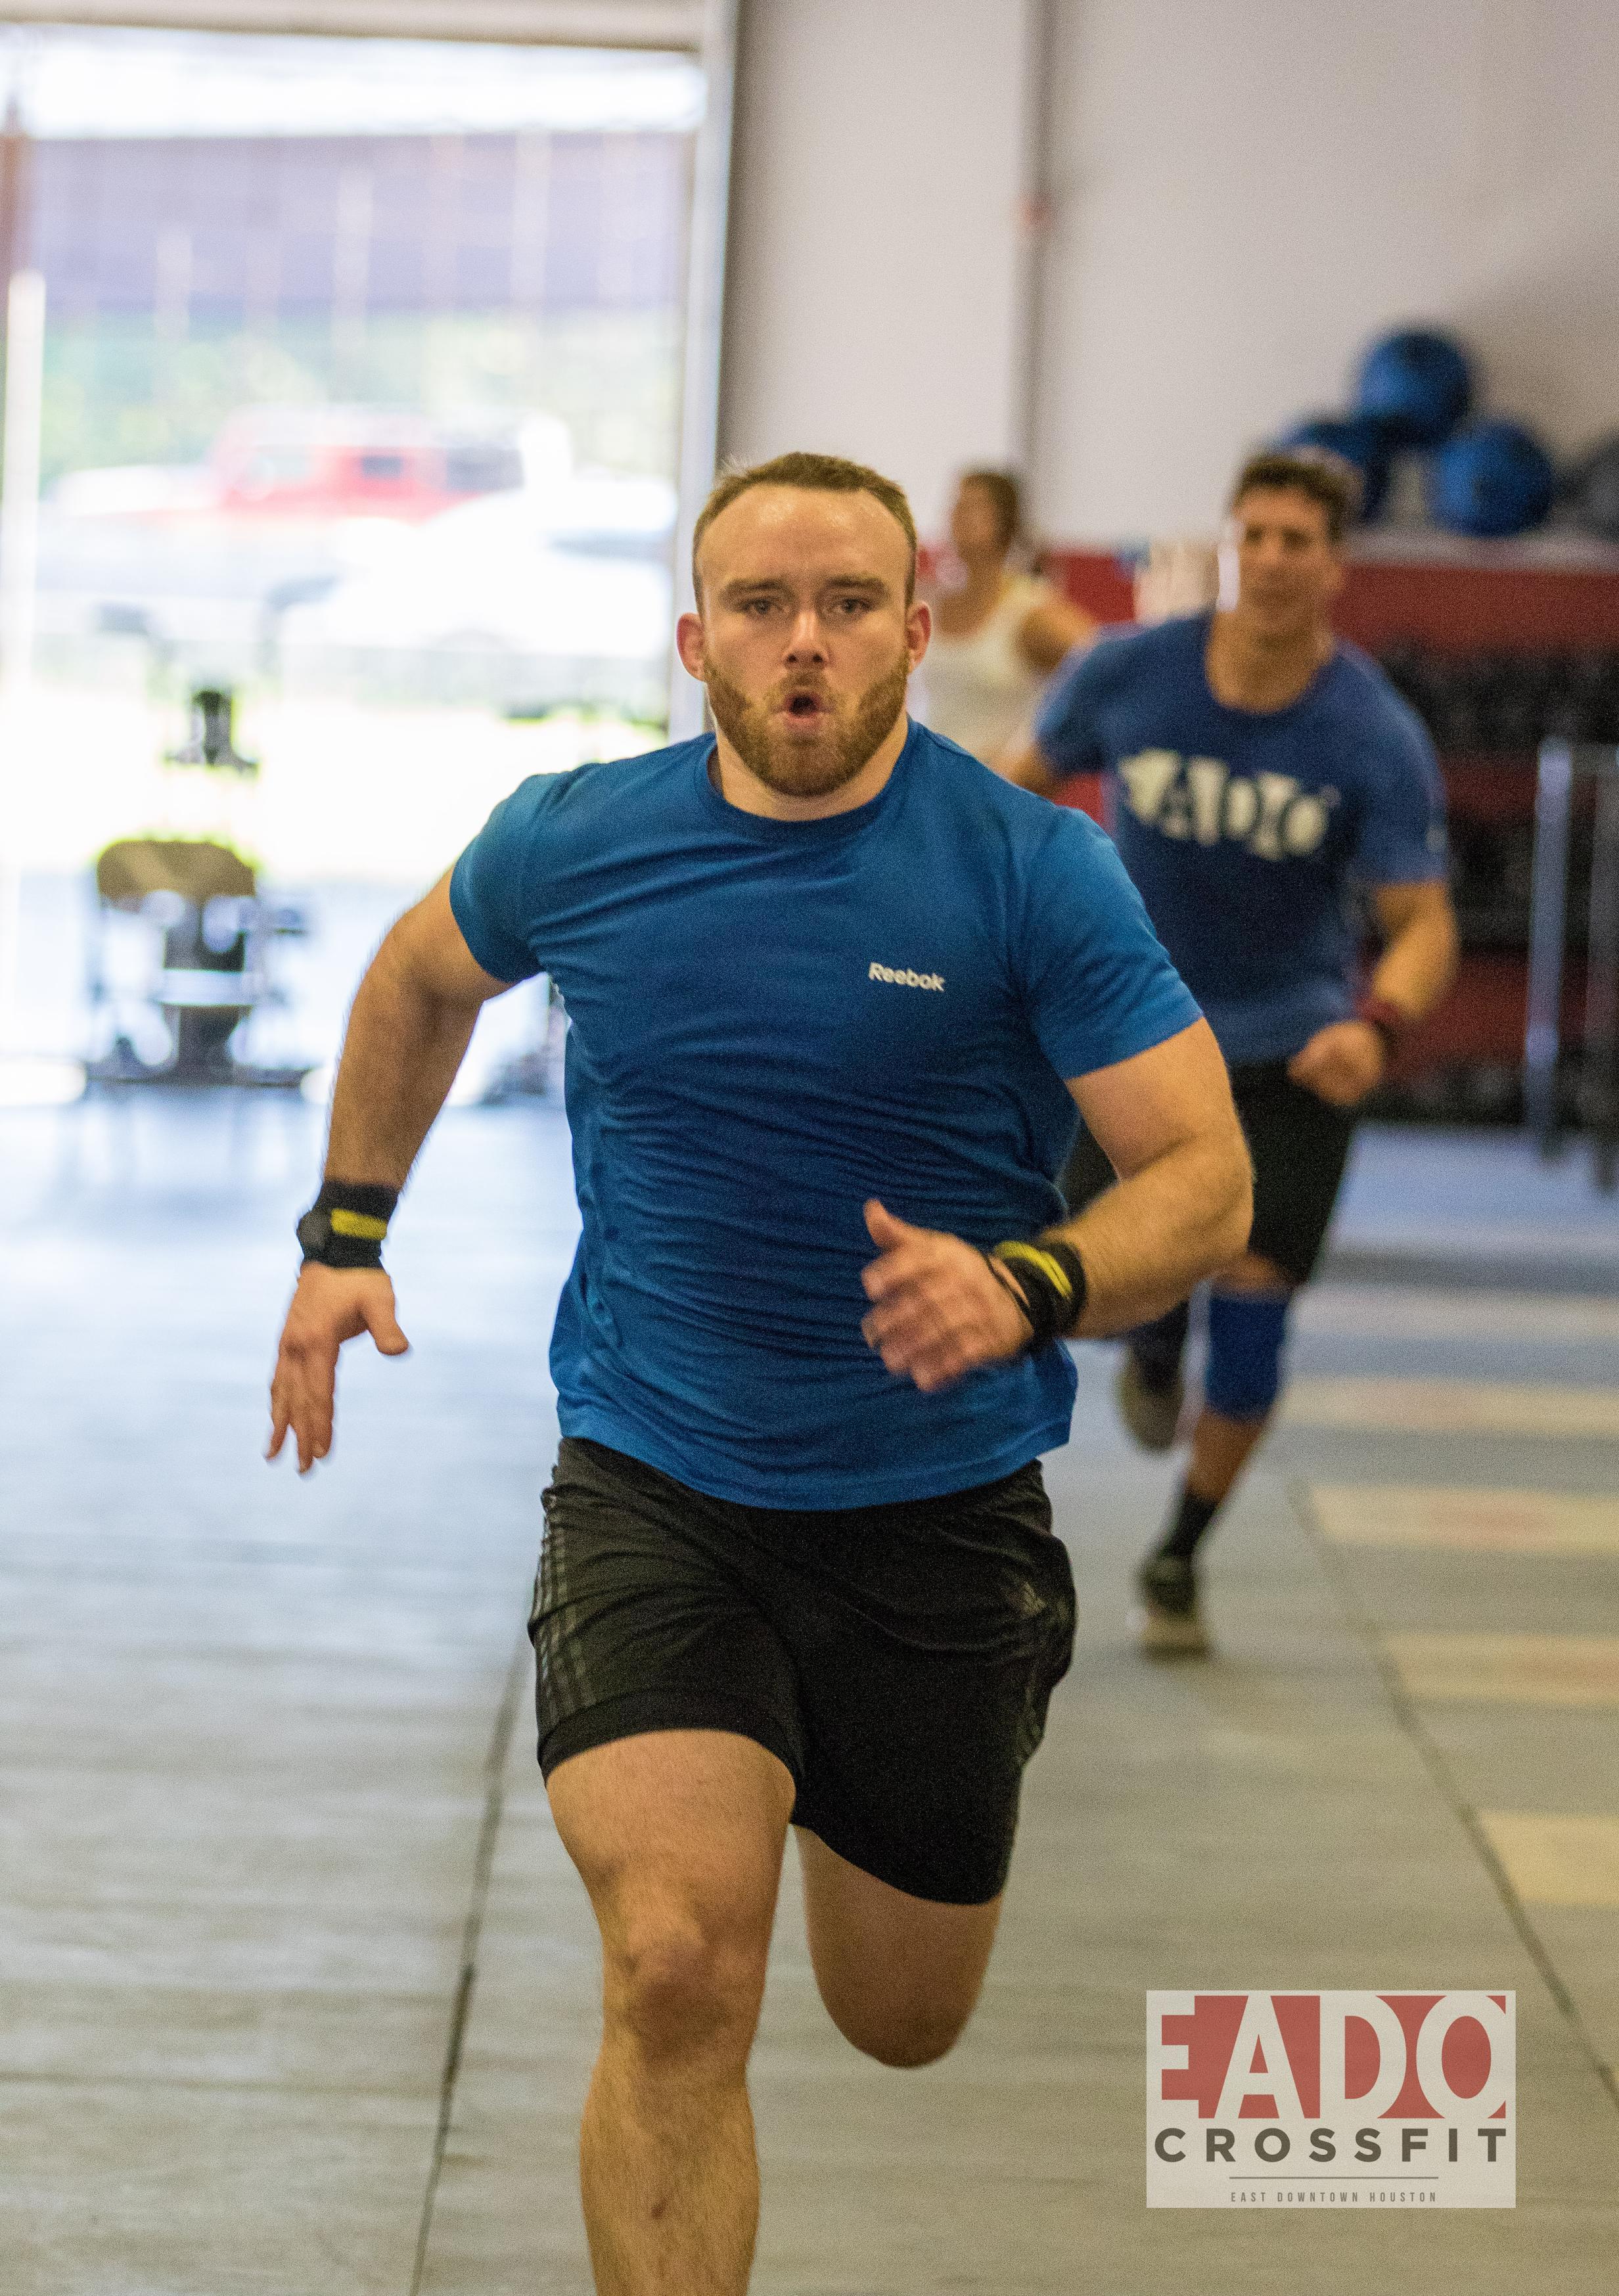 EaDo Elite Athlete Rodrigo Salas during last weeks pistol squat sprint skill work.  Photo Credit:  Sierra Prime